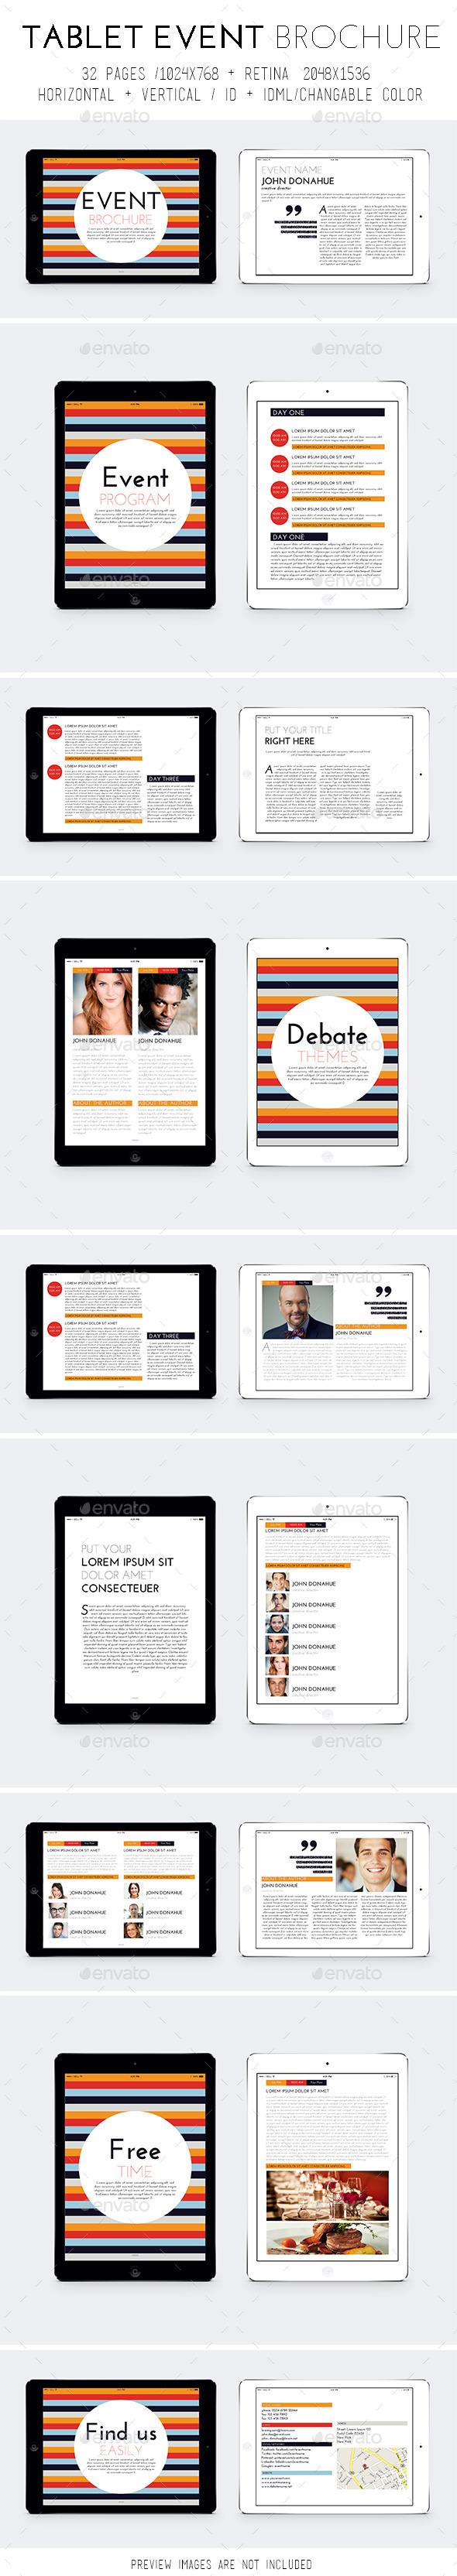 iPad & Tablet Event Template - Digital Magazines ePublishing